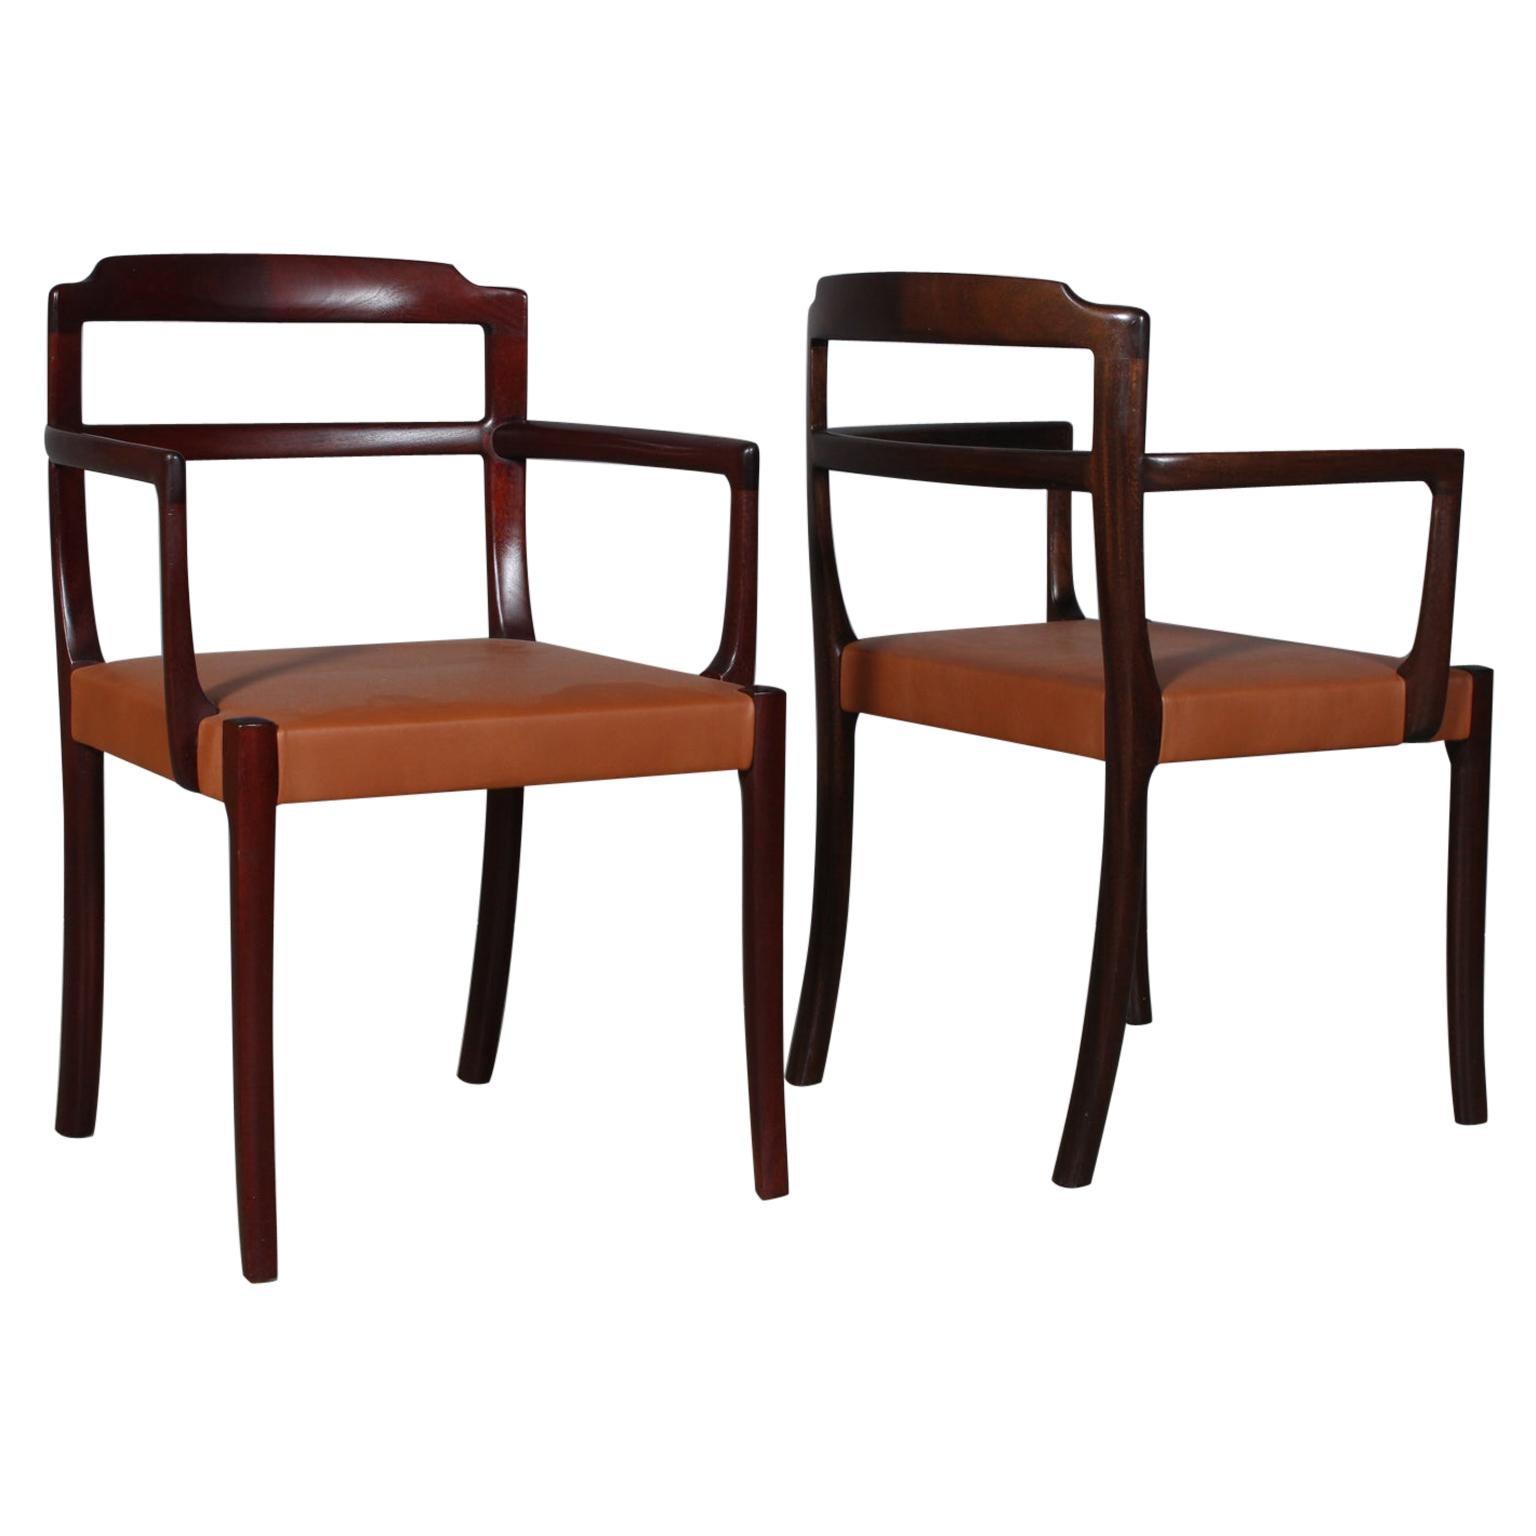 A.J. Iversen Chairs